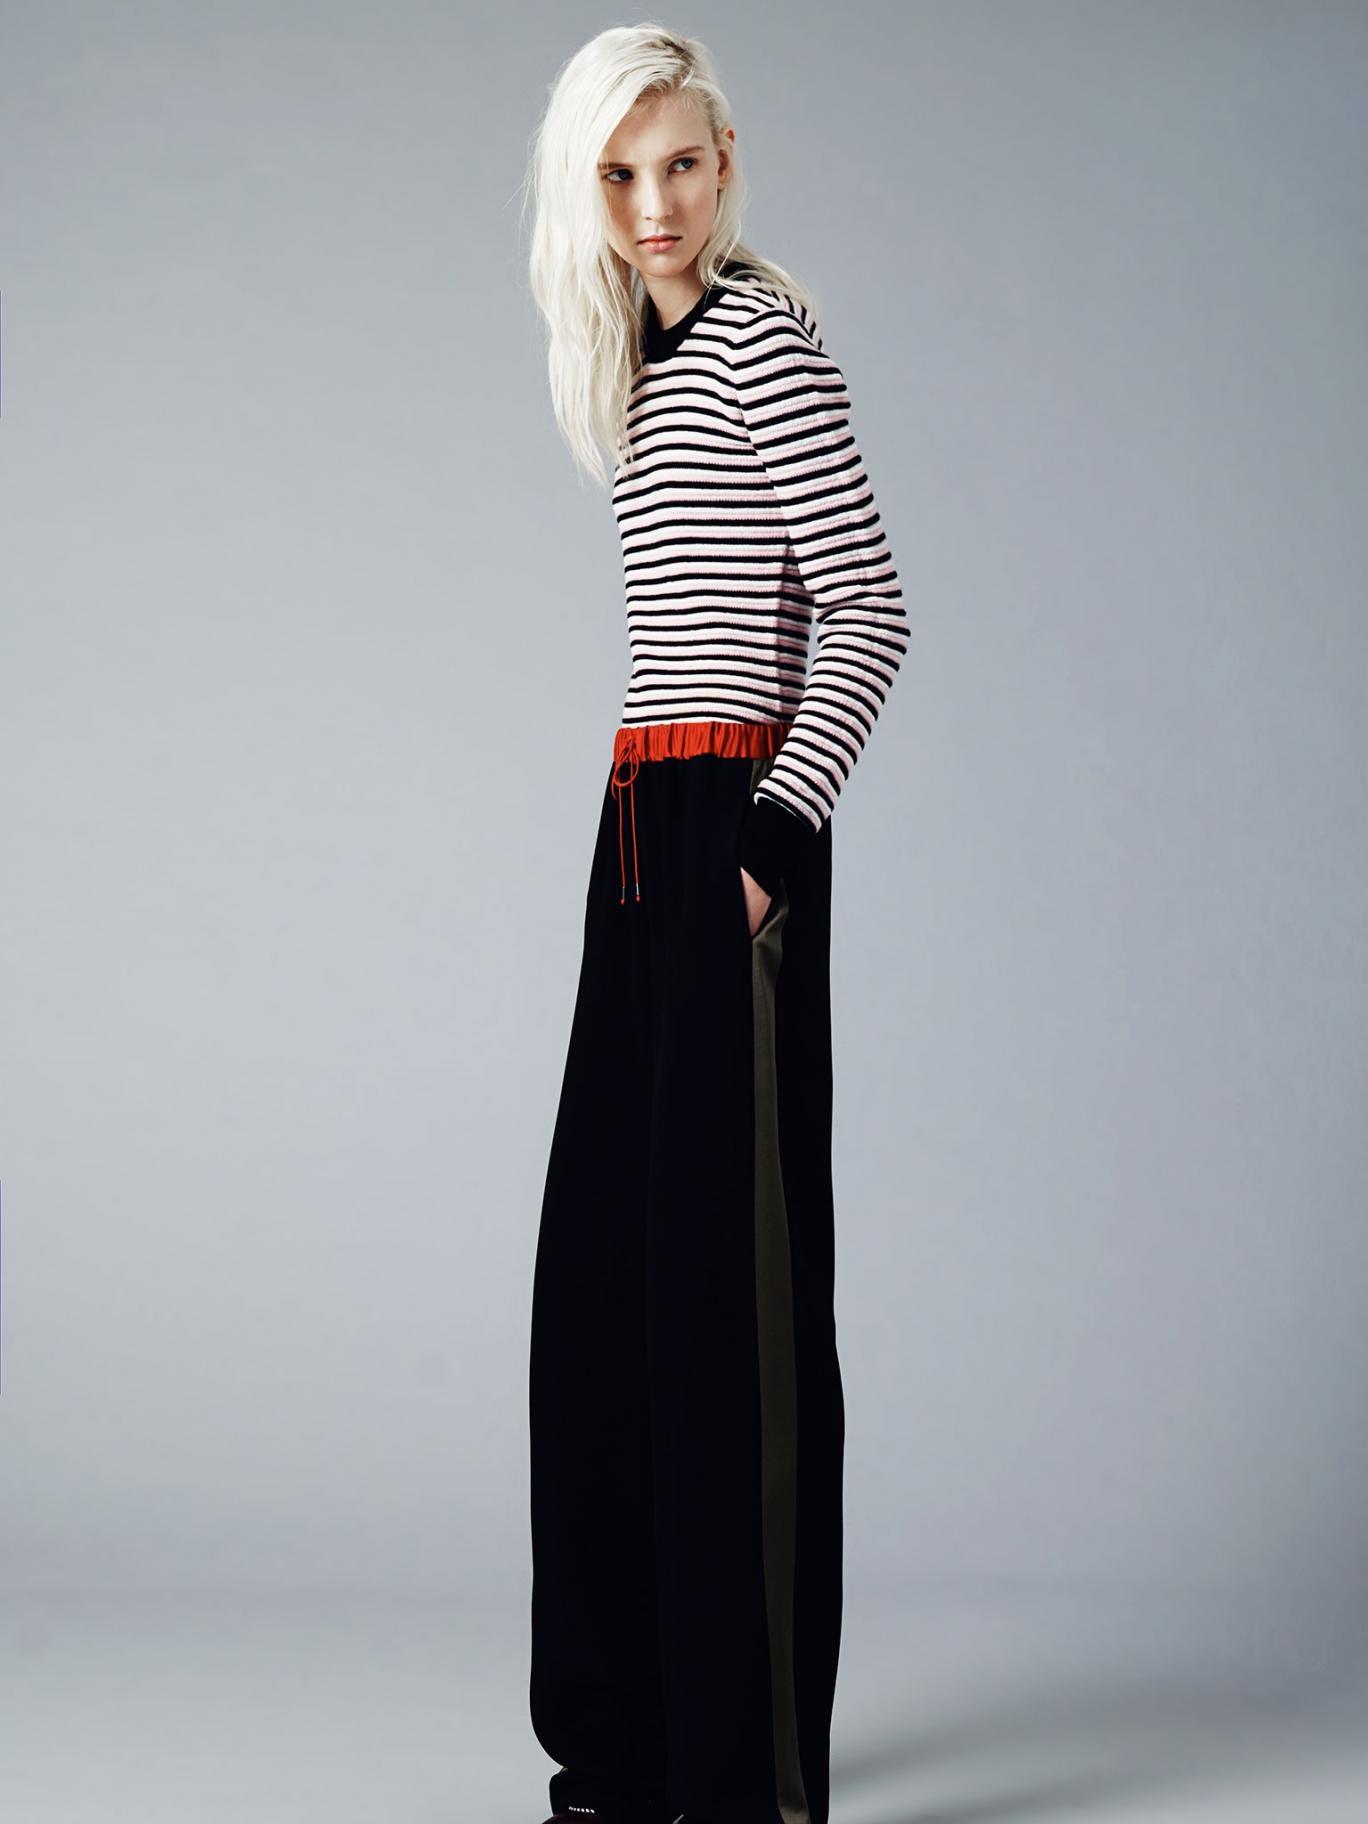 Model wears By David Phelan Jonathan Saunders prefall 2014